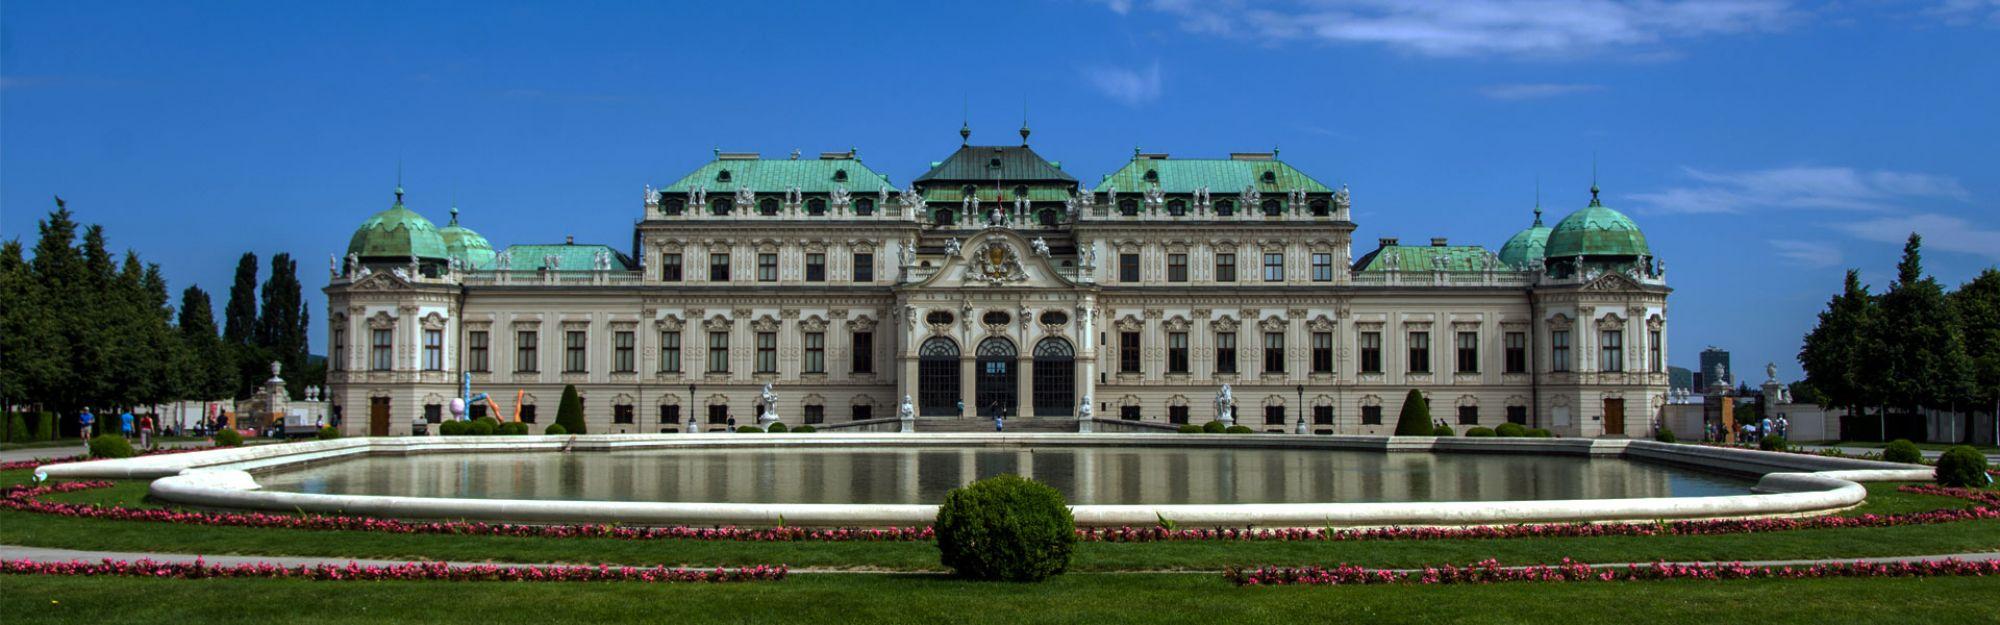 Wien Premium-Ticket + Schloss Belvedere